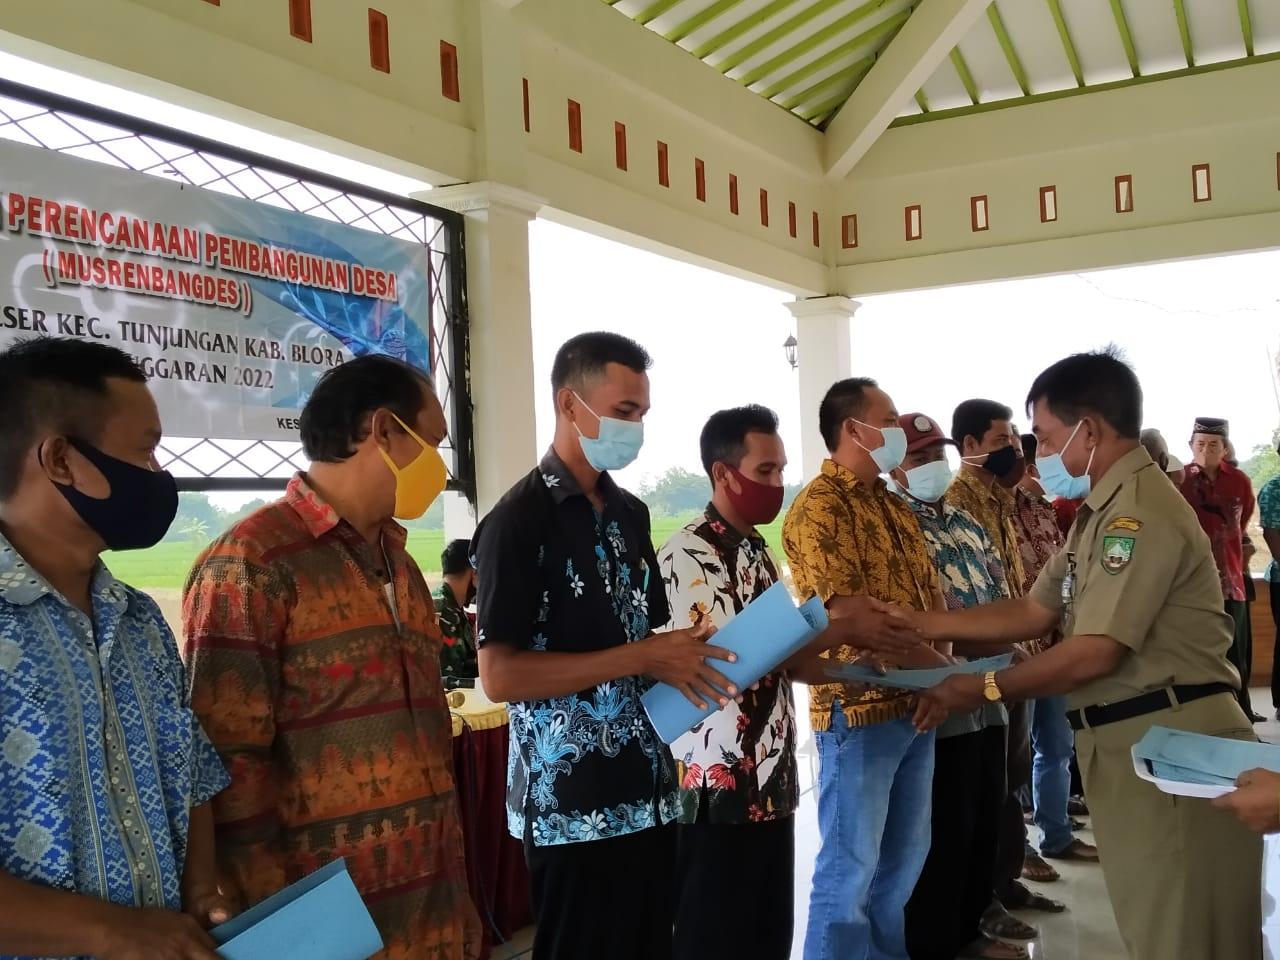 Desa Keser Sukses Gelar Musrenbangdes 2022